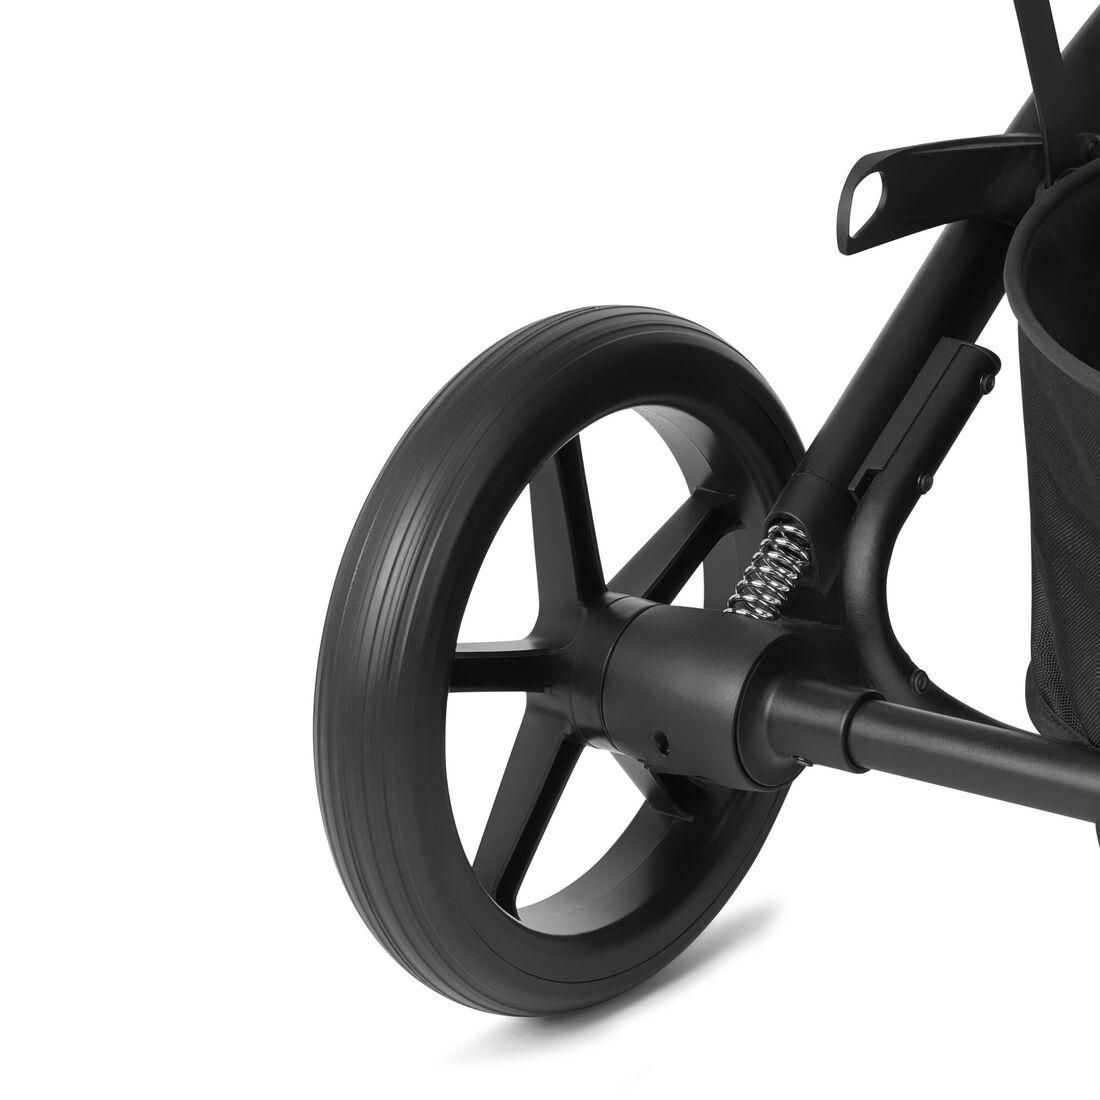 CYBEX Balios S Lux - Soho Grey (Schwarzer Rahmen) in Soho Grey (Black Frame) large Bild 8